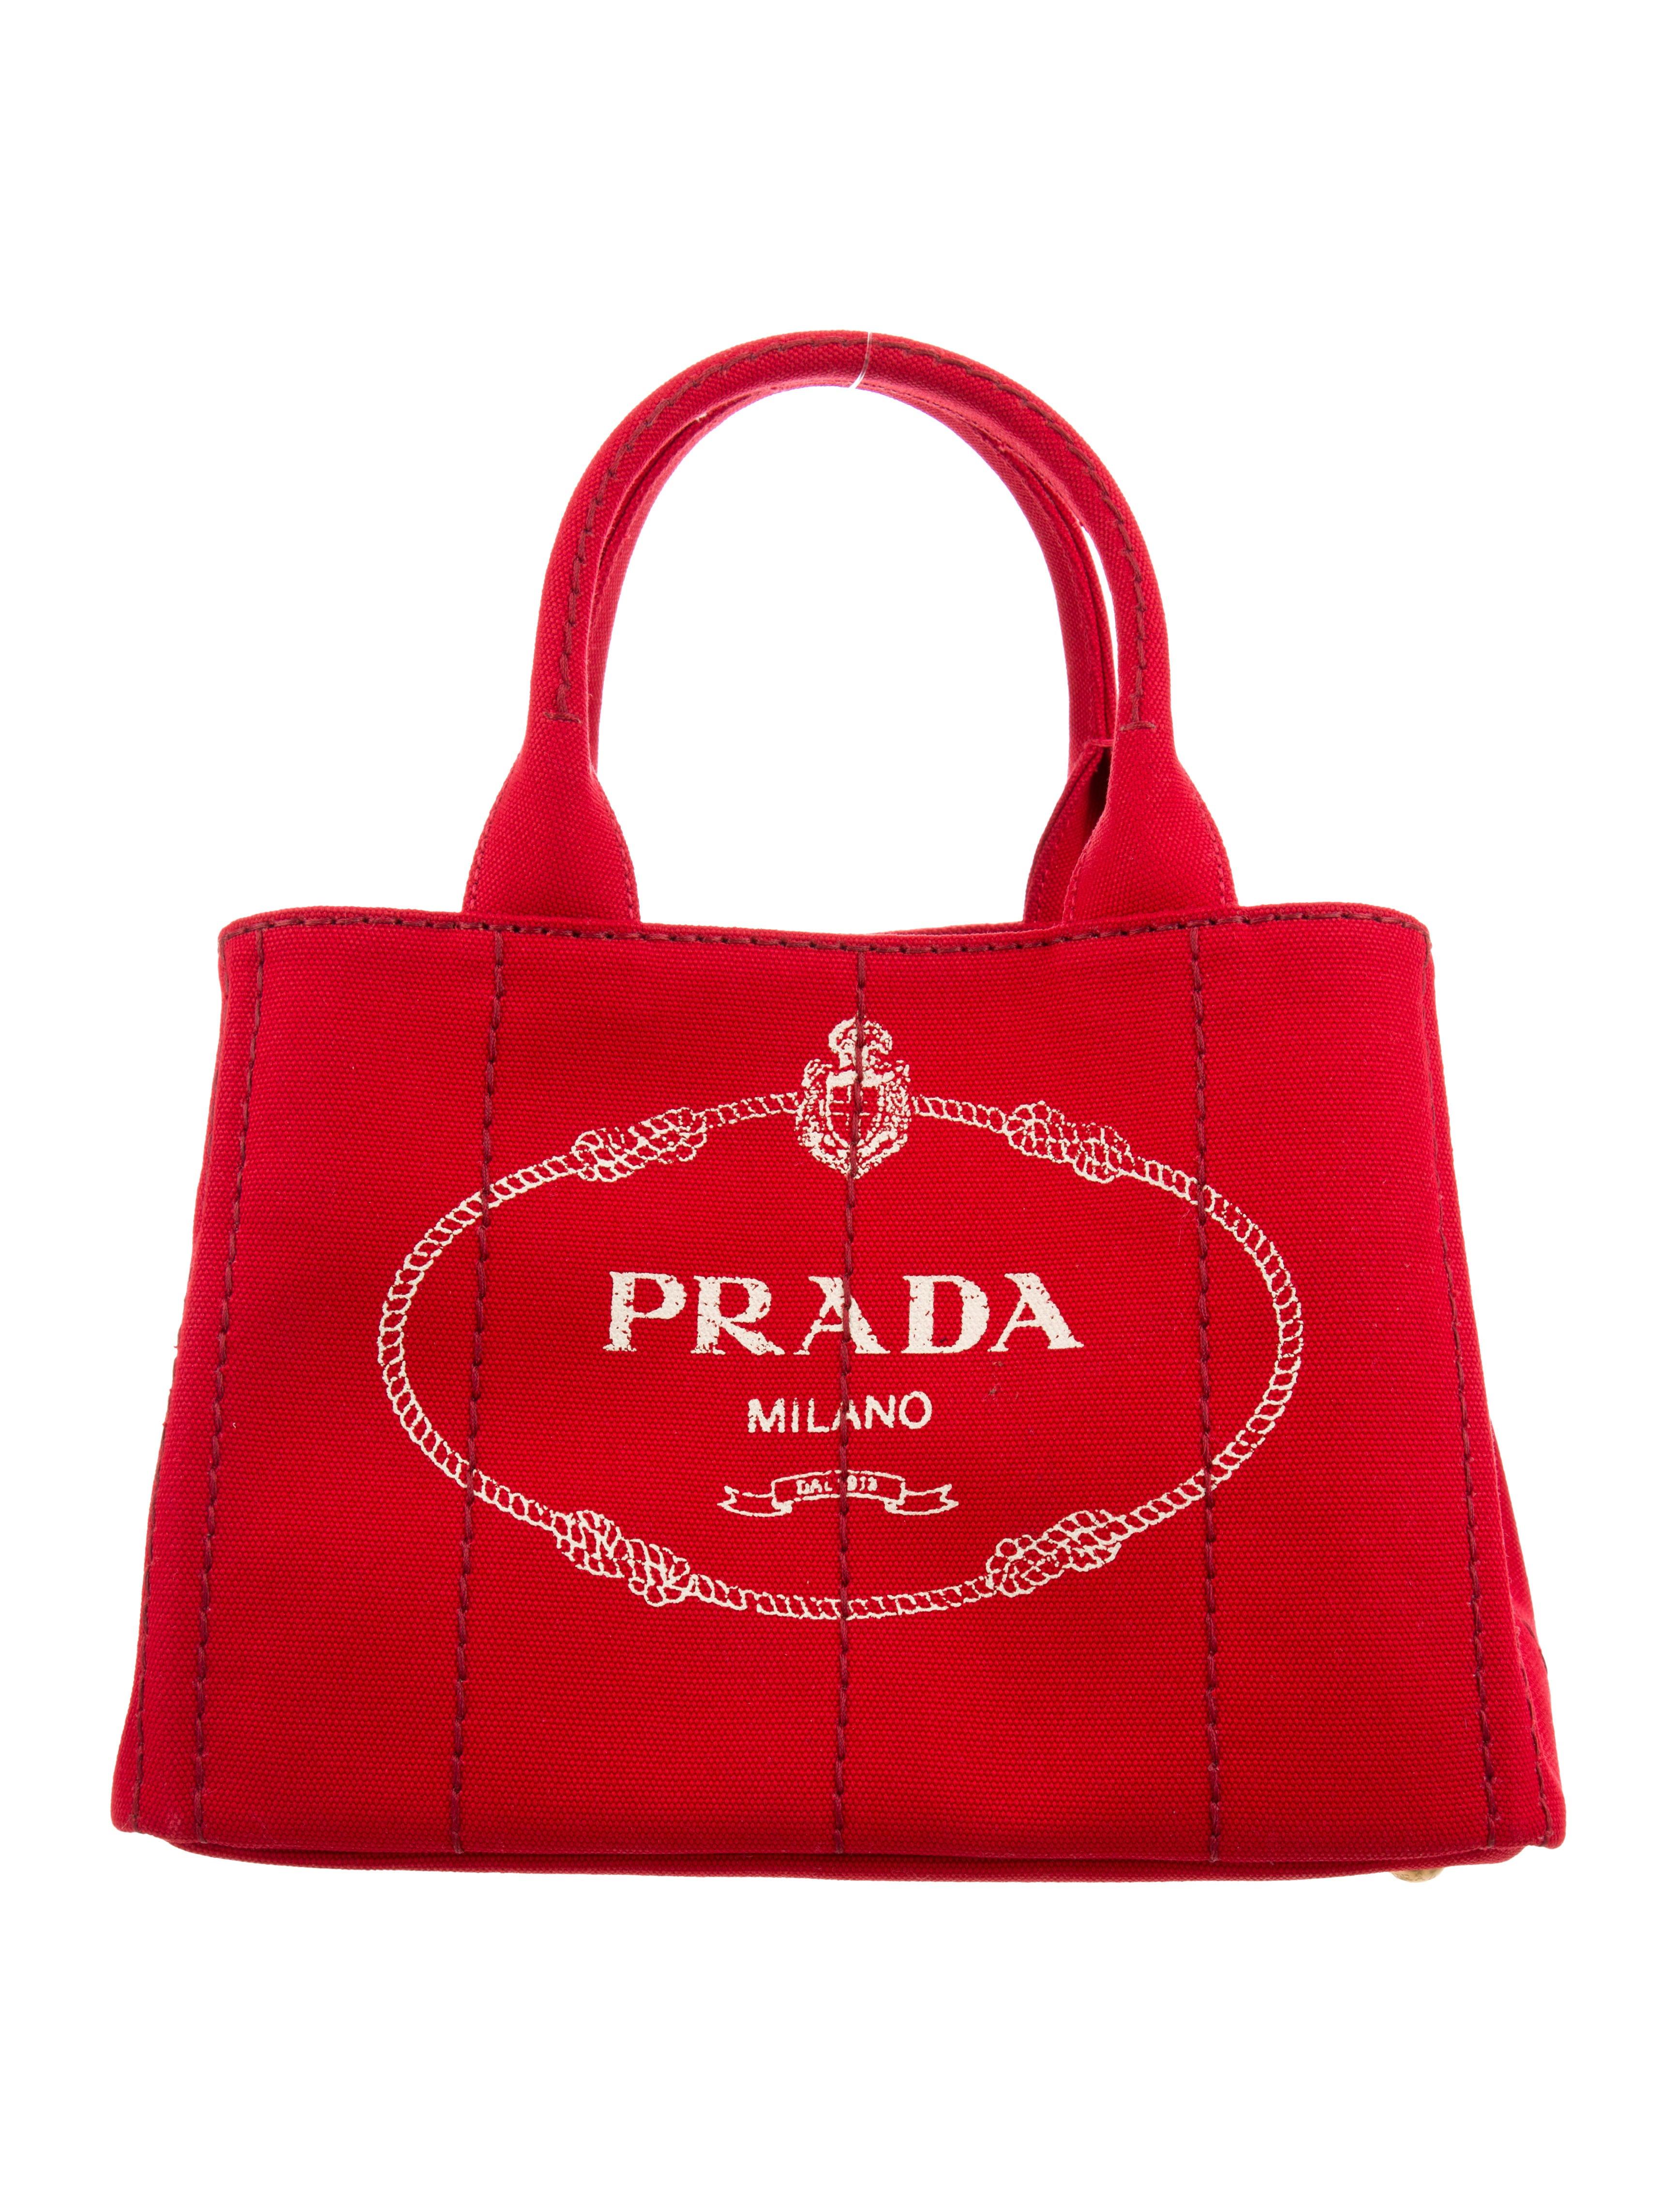 41f7d7775b88 Prada Canvas Logo Tote - Handbags - PRA243529 | The RealReal